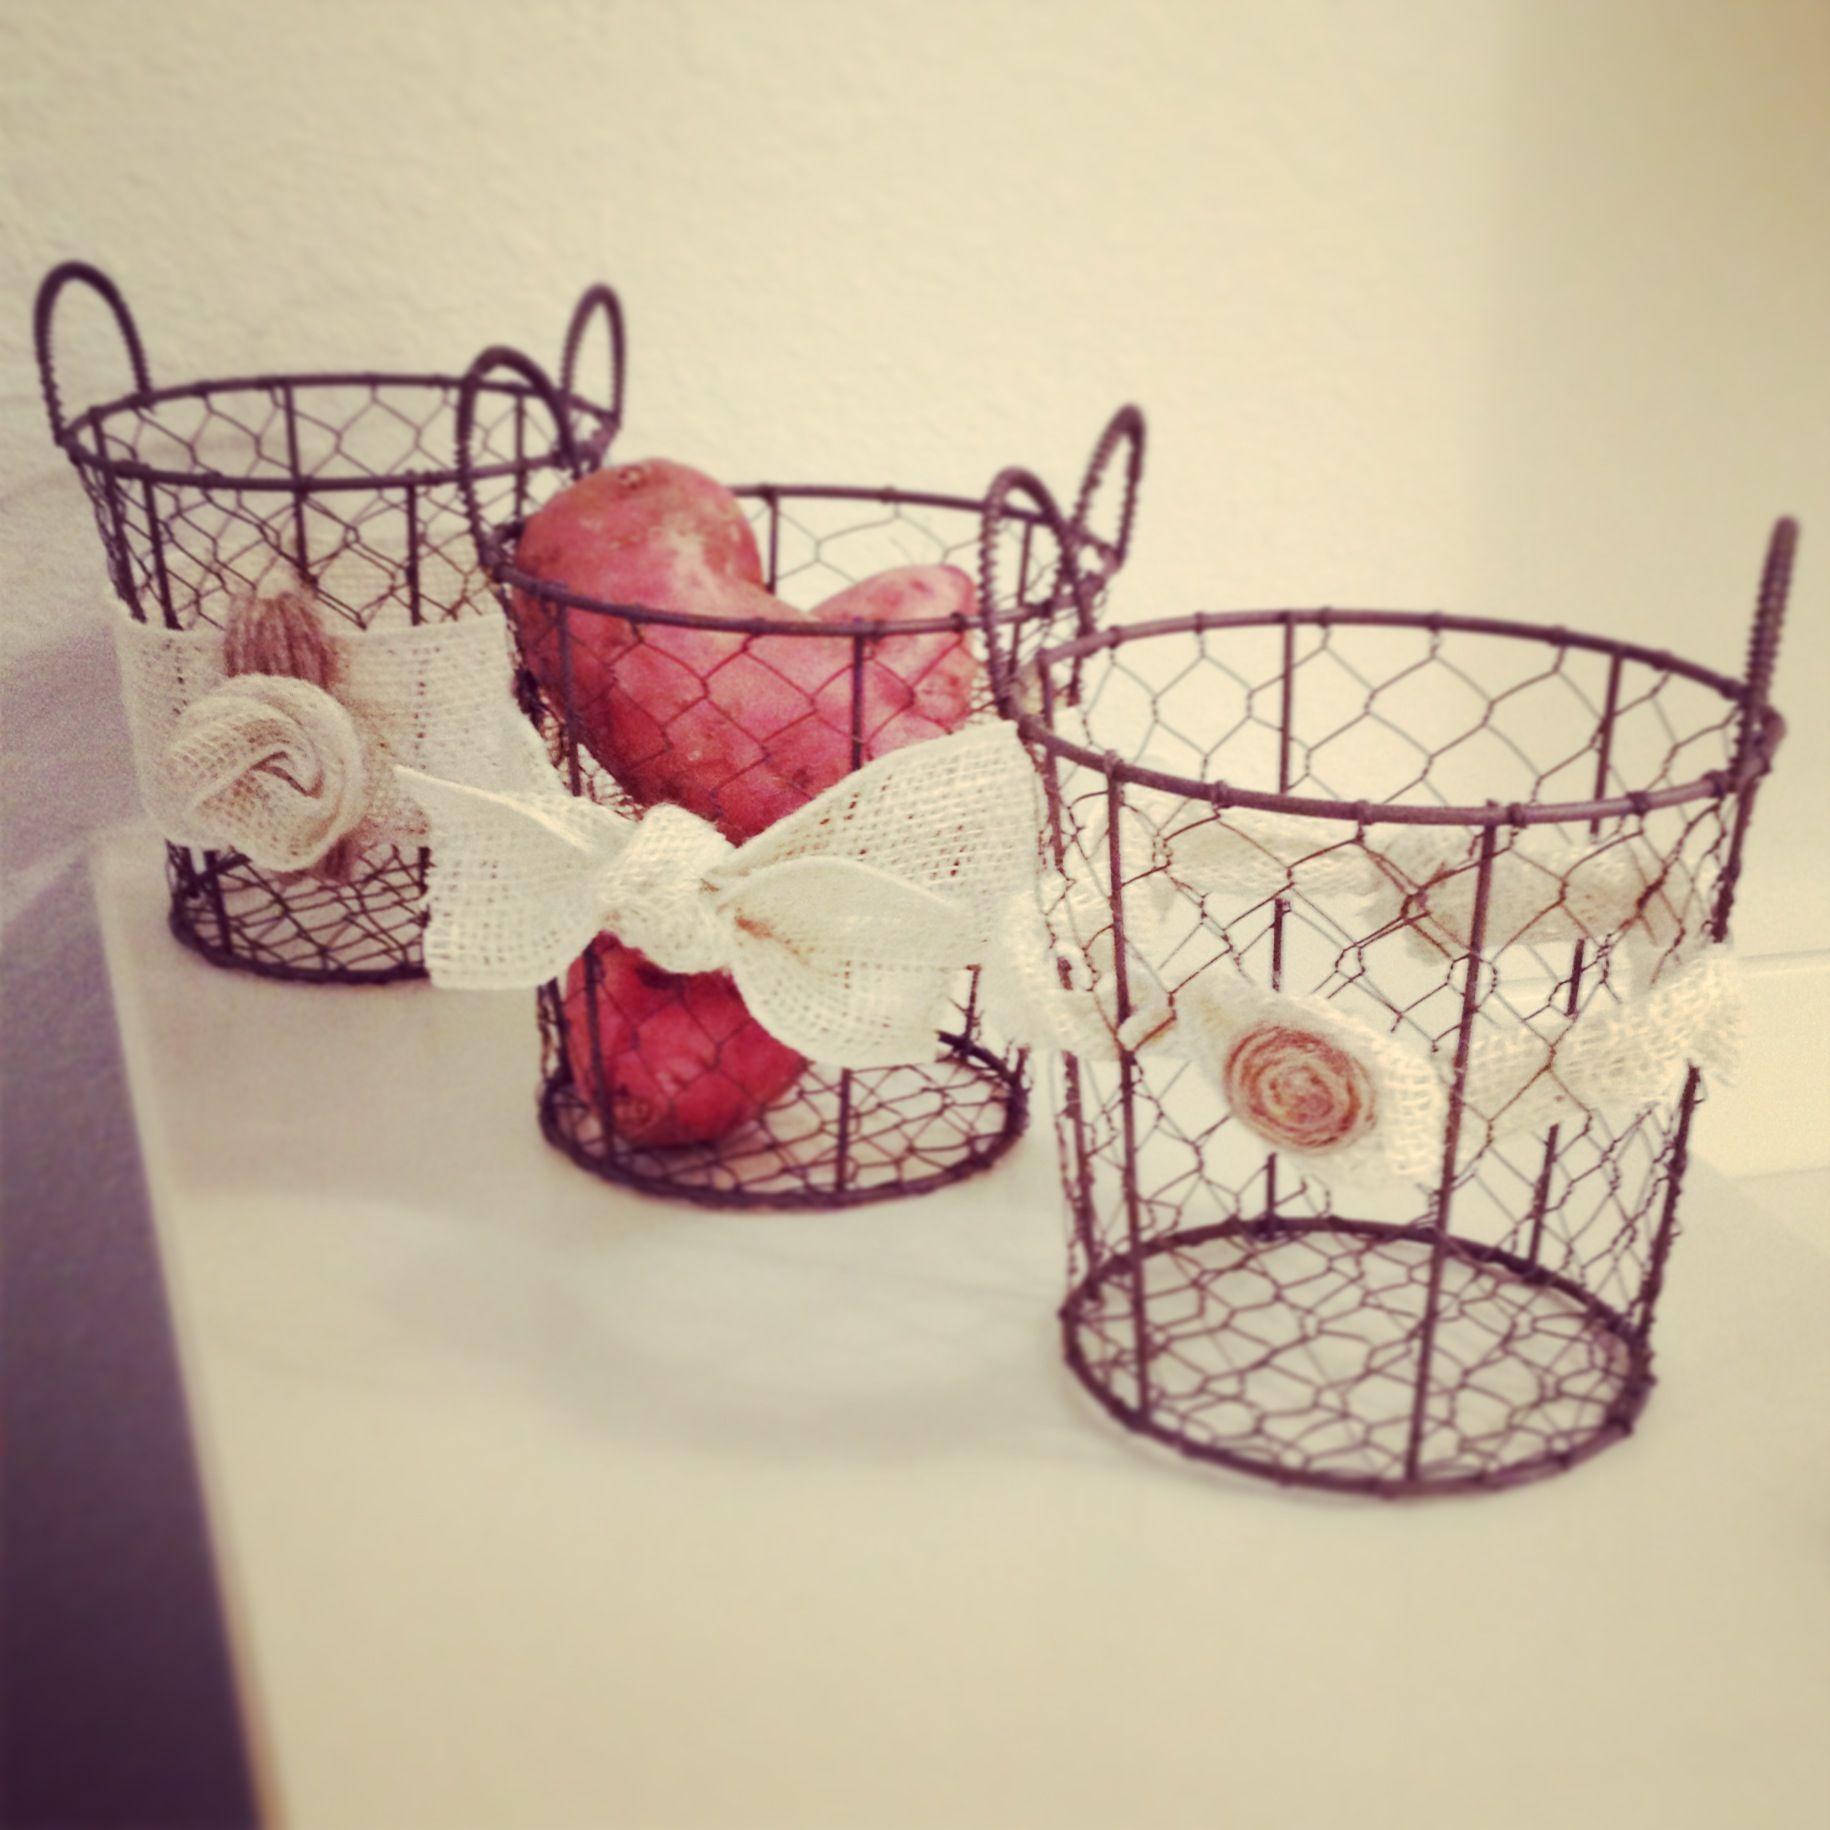 wire baskets for my kitchen!